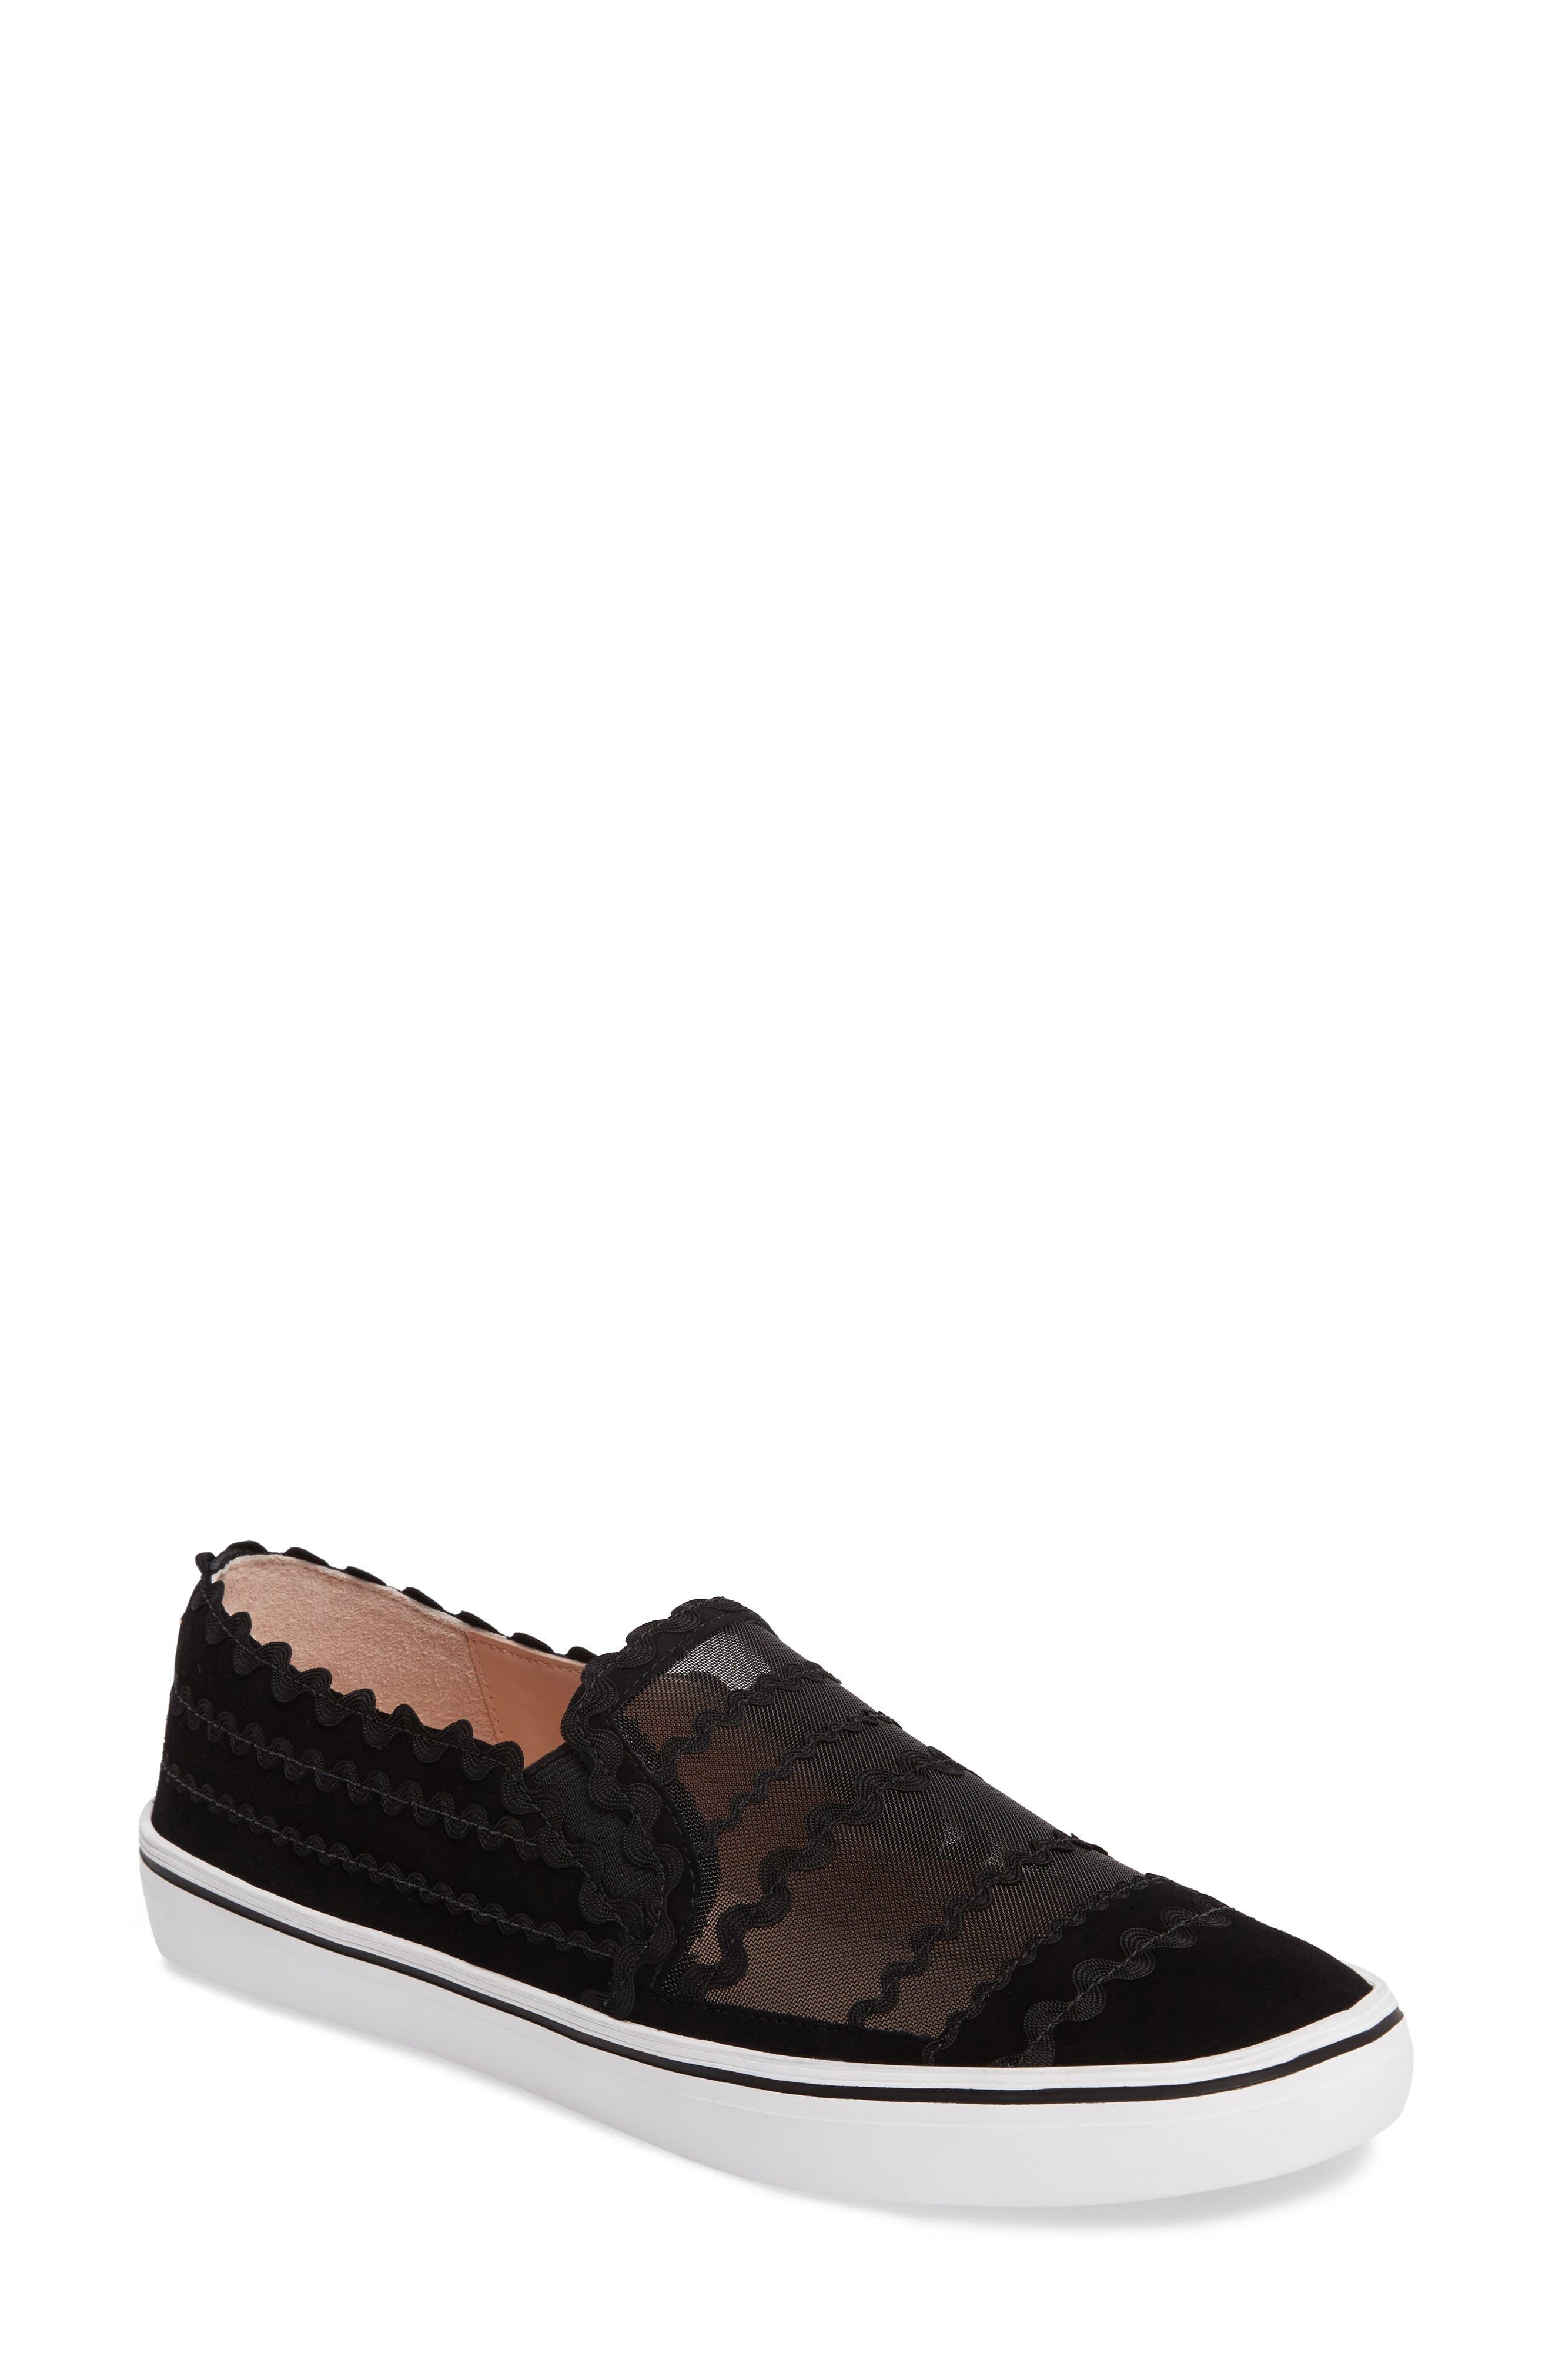 senza slip-on sneaker, Main, color, 001